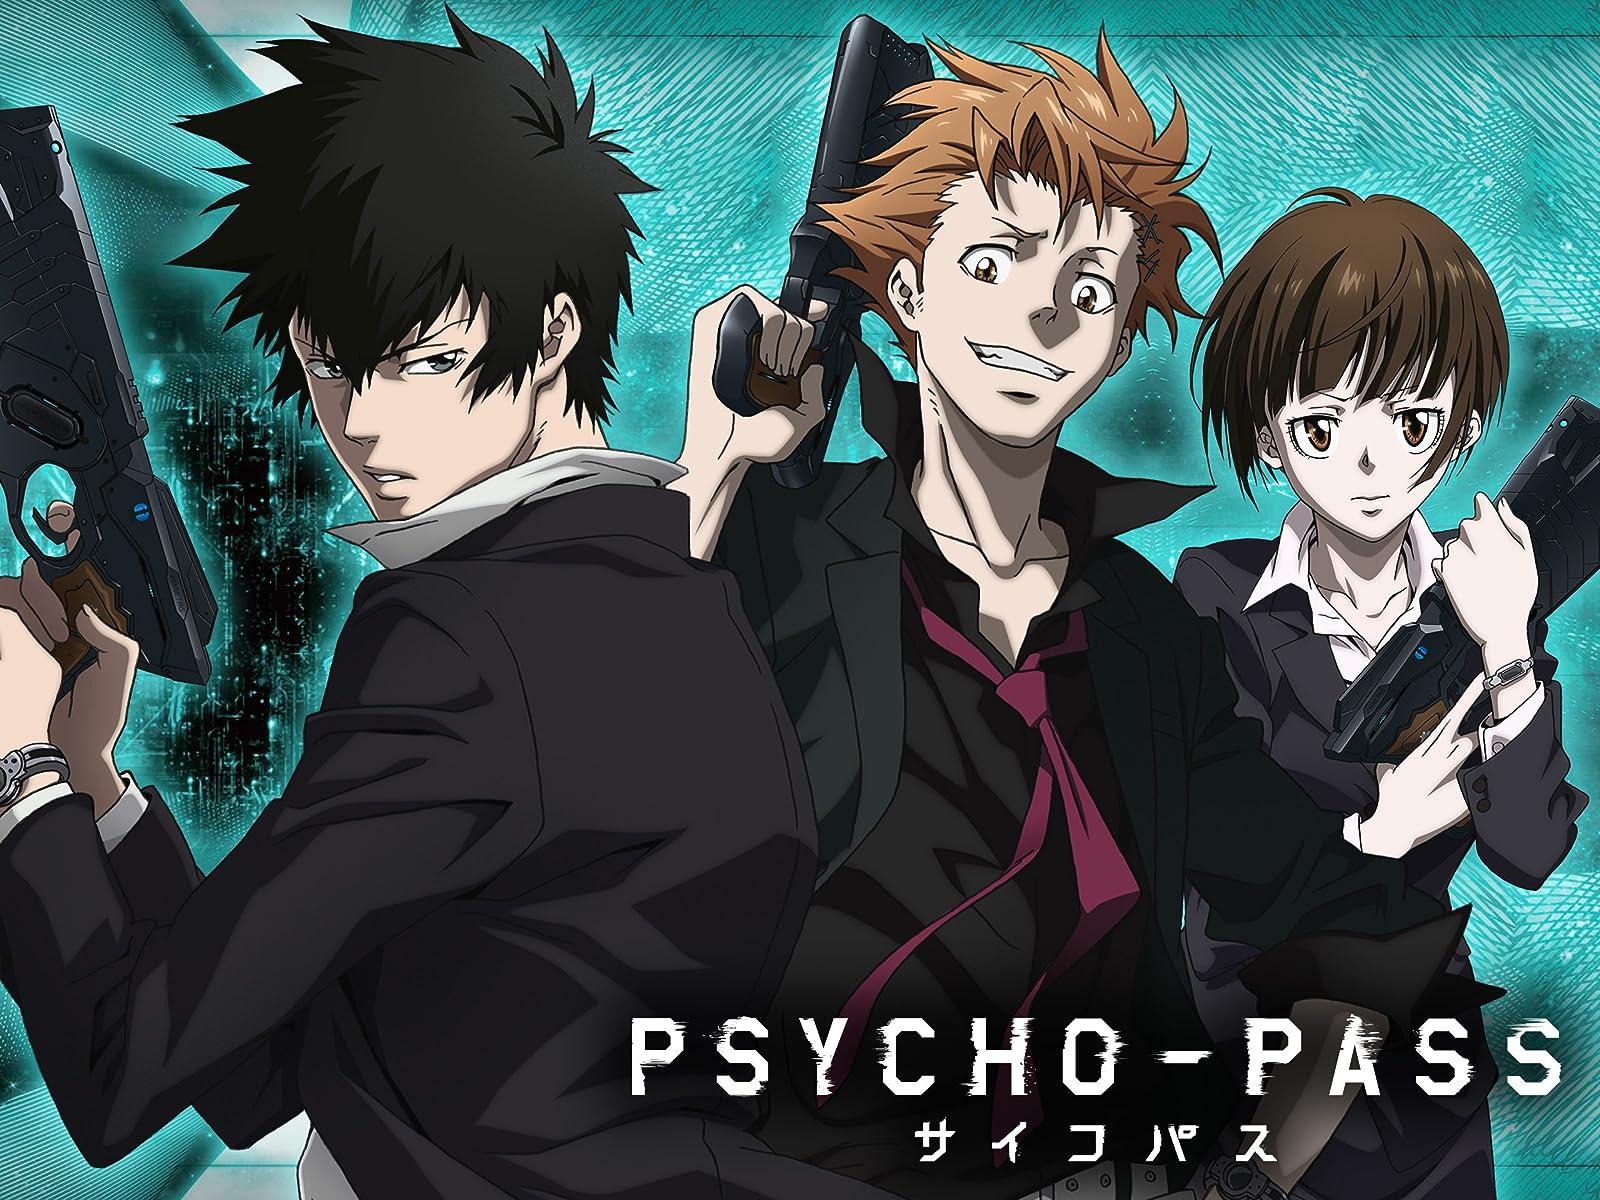 Watch Psycho Pass 3 Prime Video